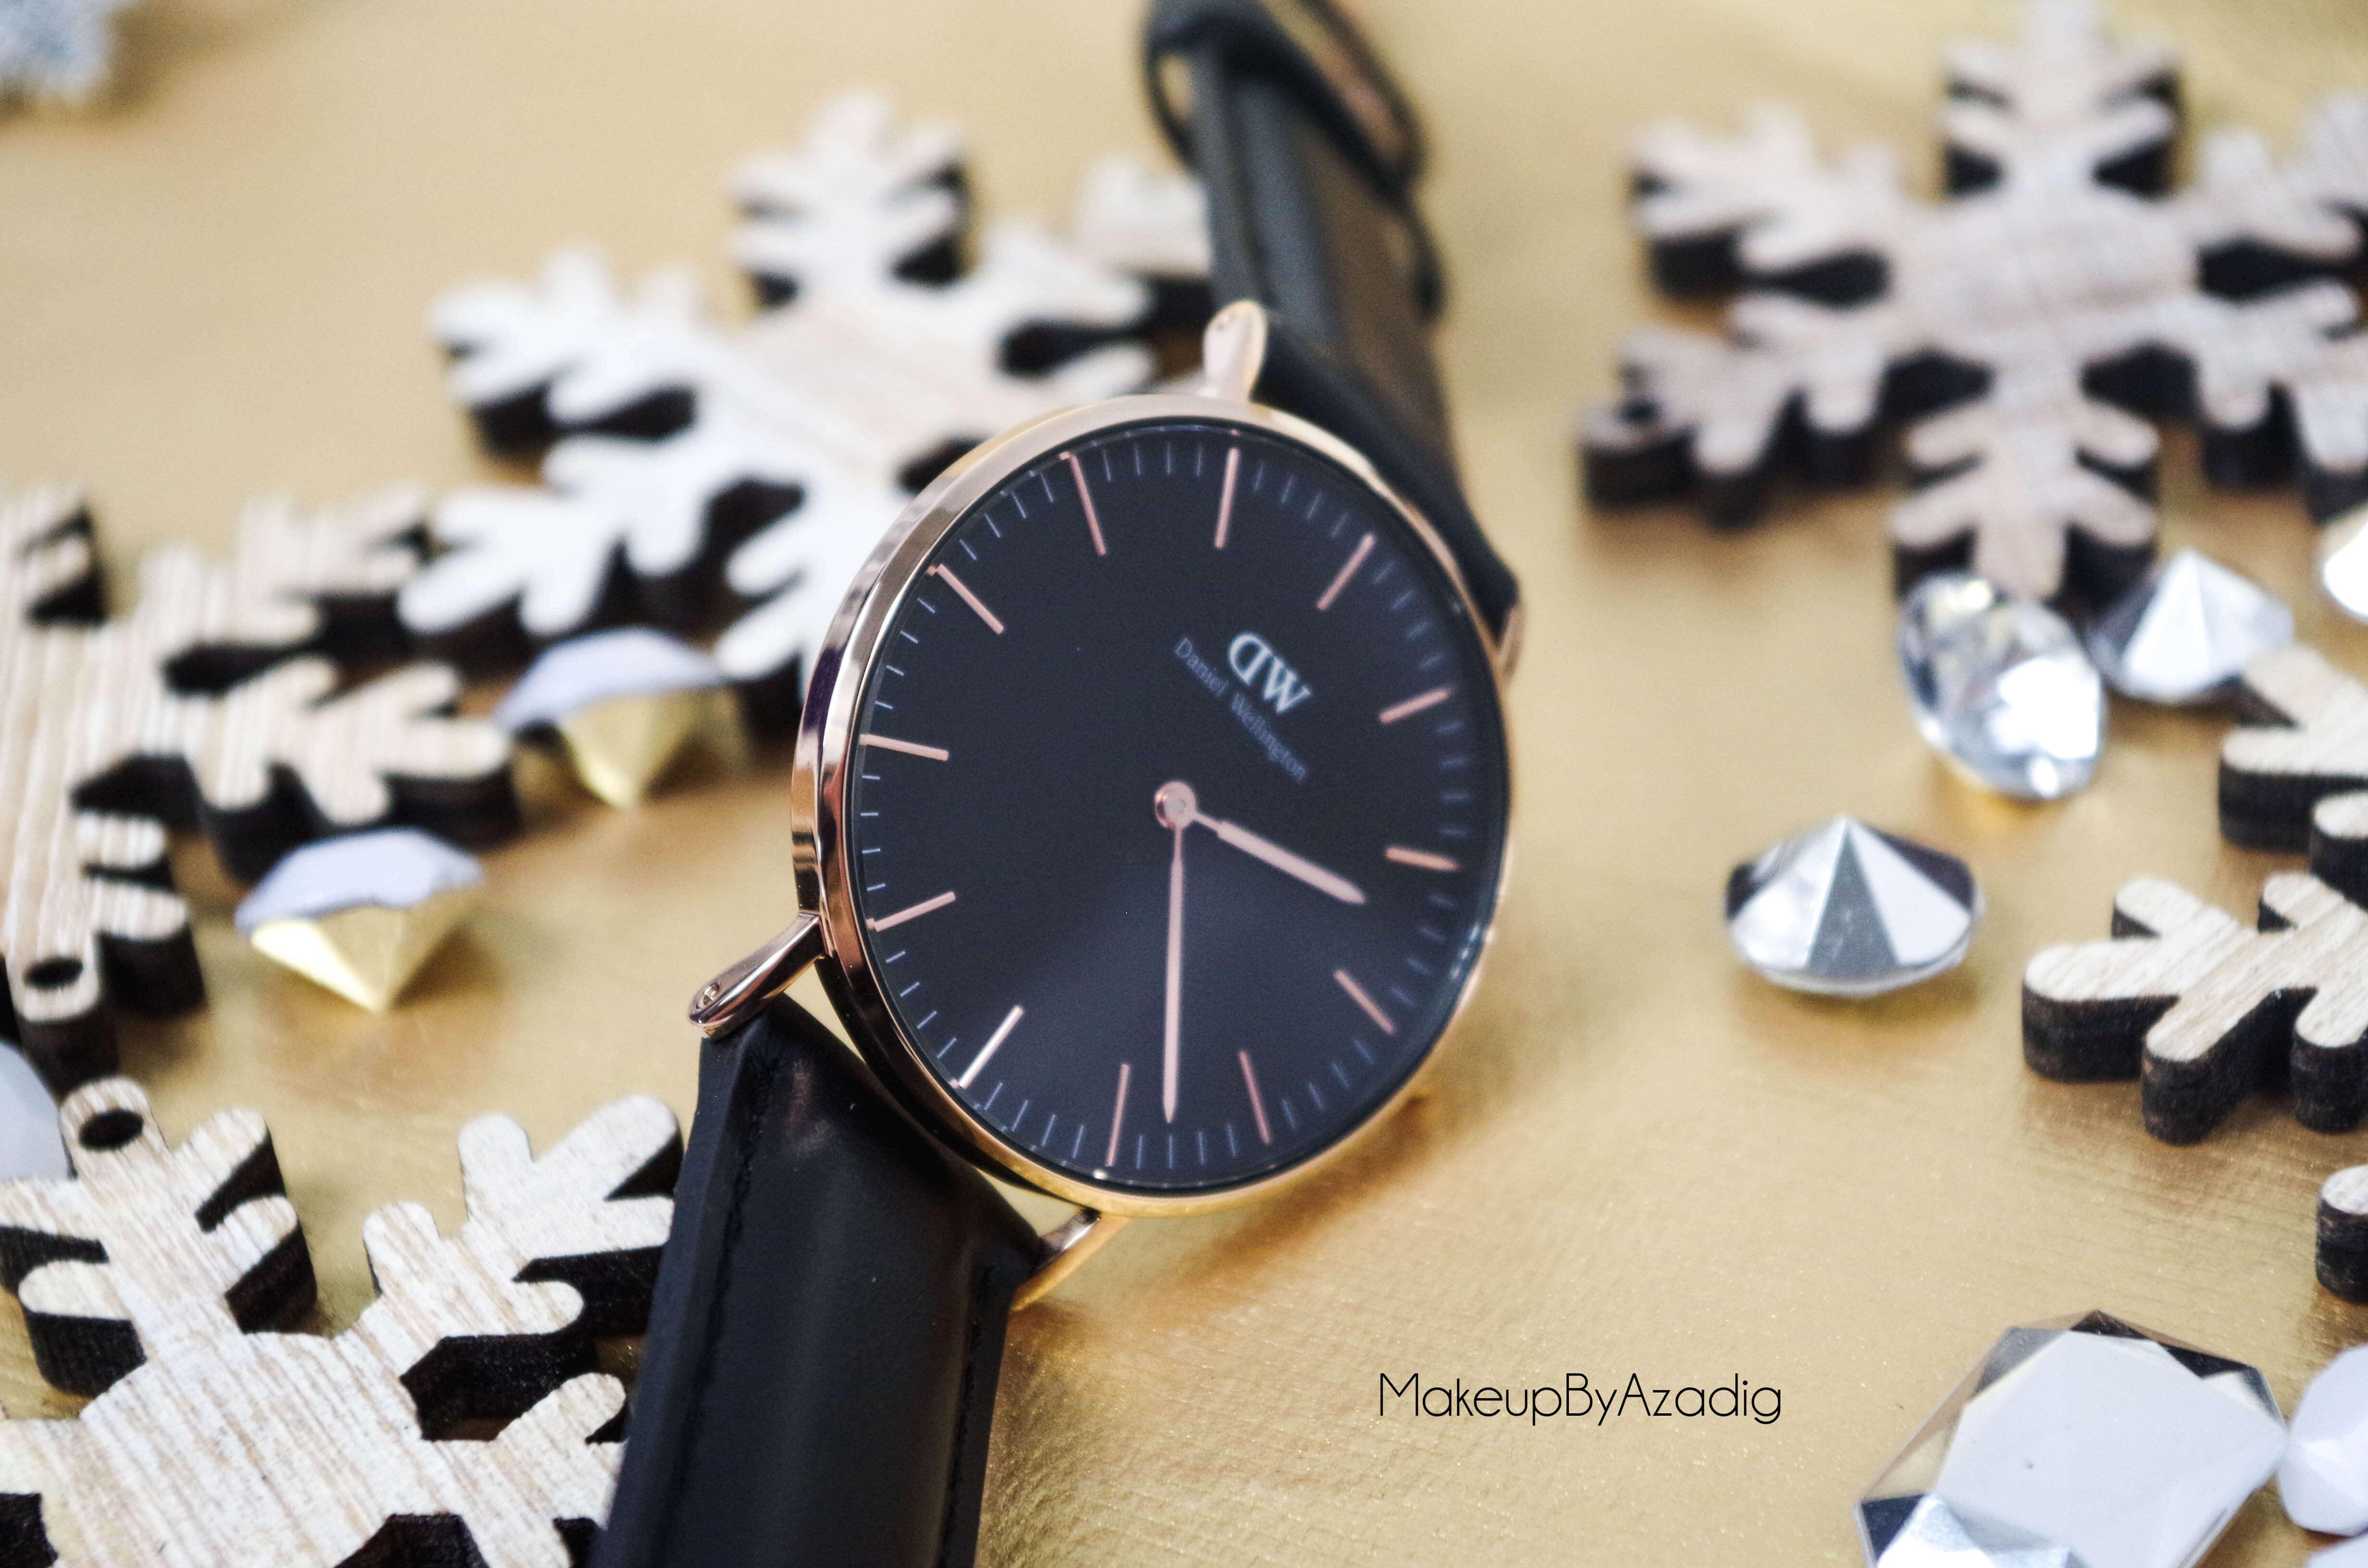 makeupbyazadig-daniel-wellington-montre-classic-black-sheffield-code-promo-troyes-paris-elegant